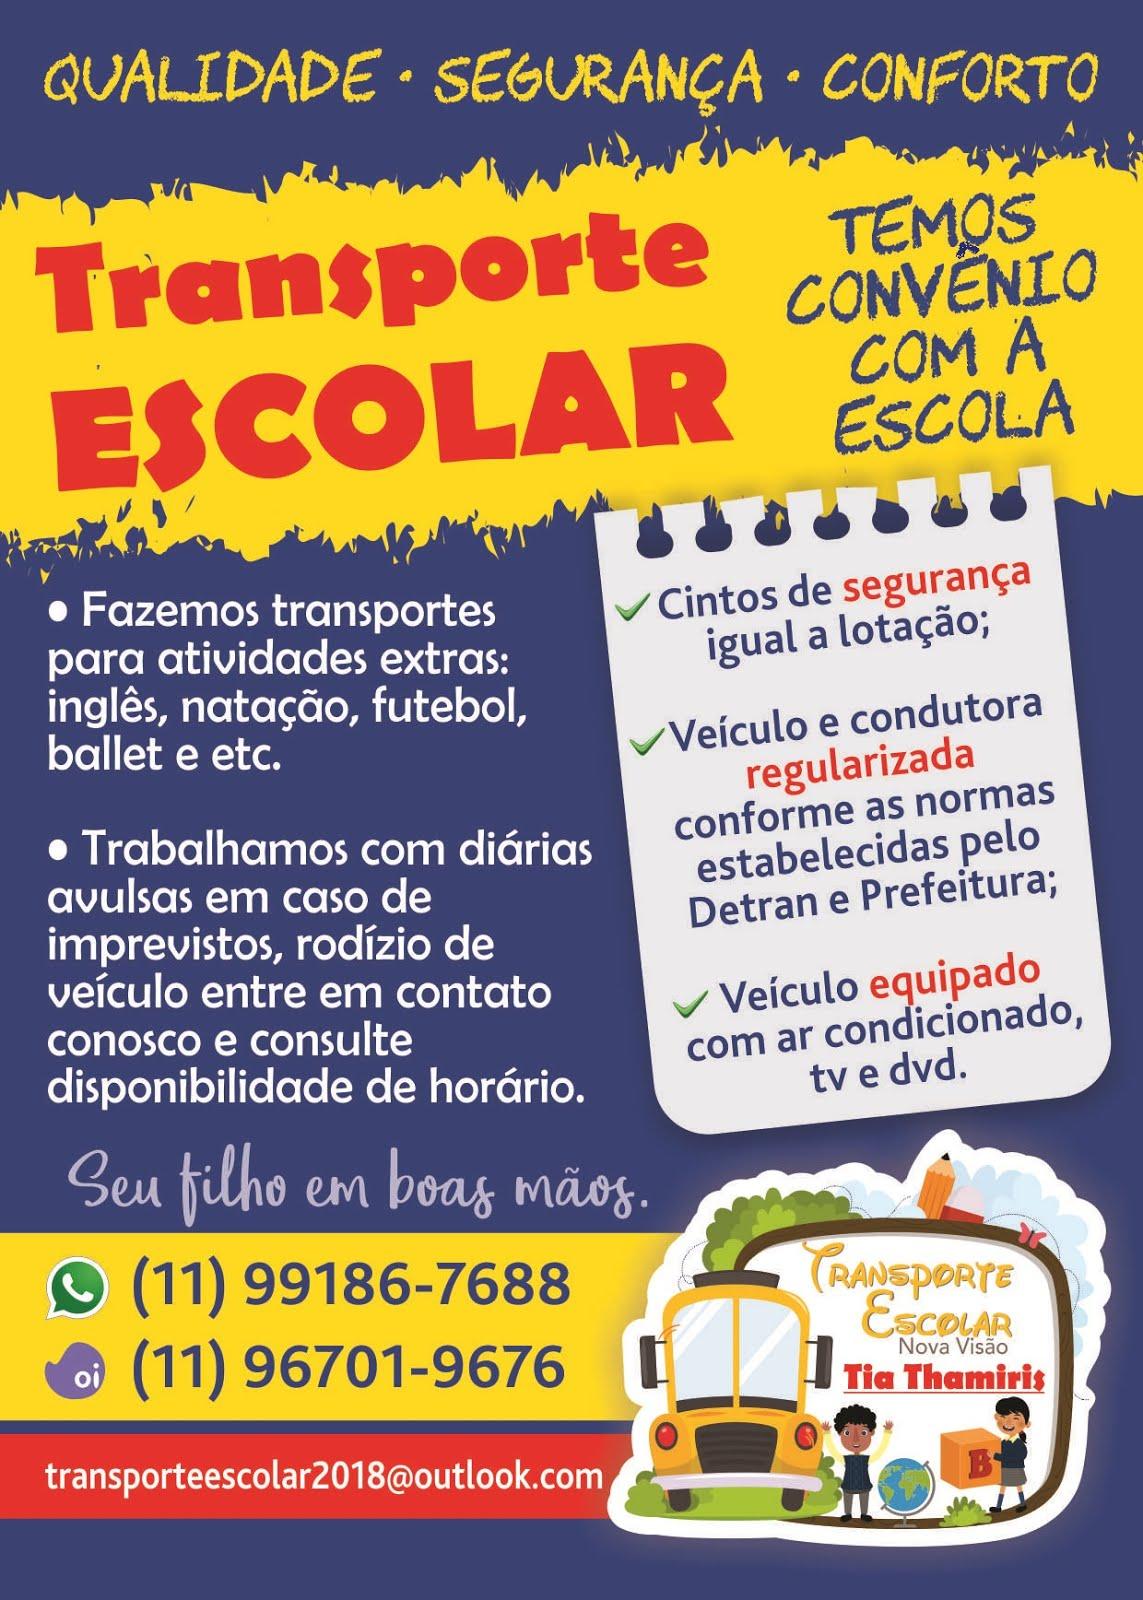 AGORA TEMOS TRANSPORTE ESCOLAR EXCLUSIVO!